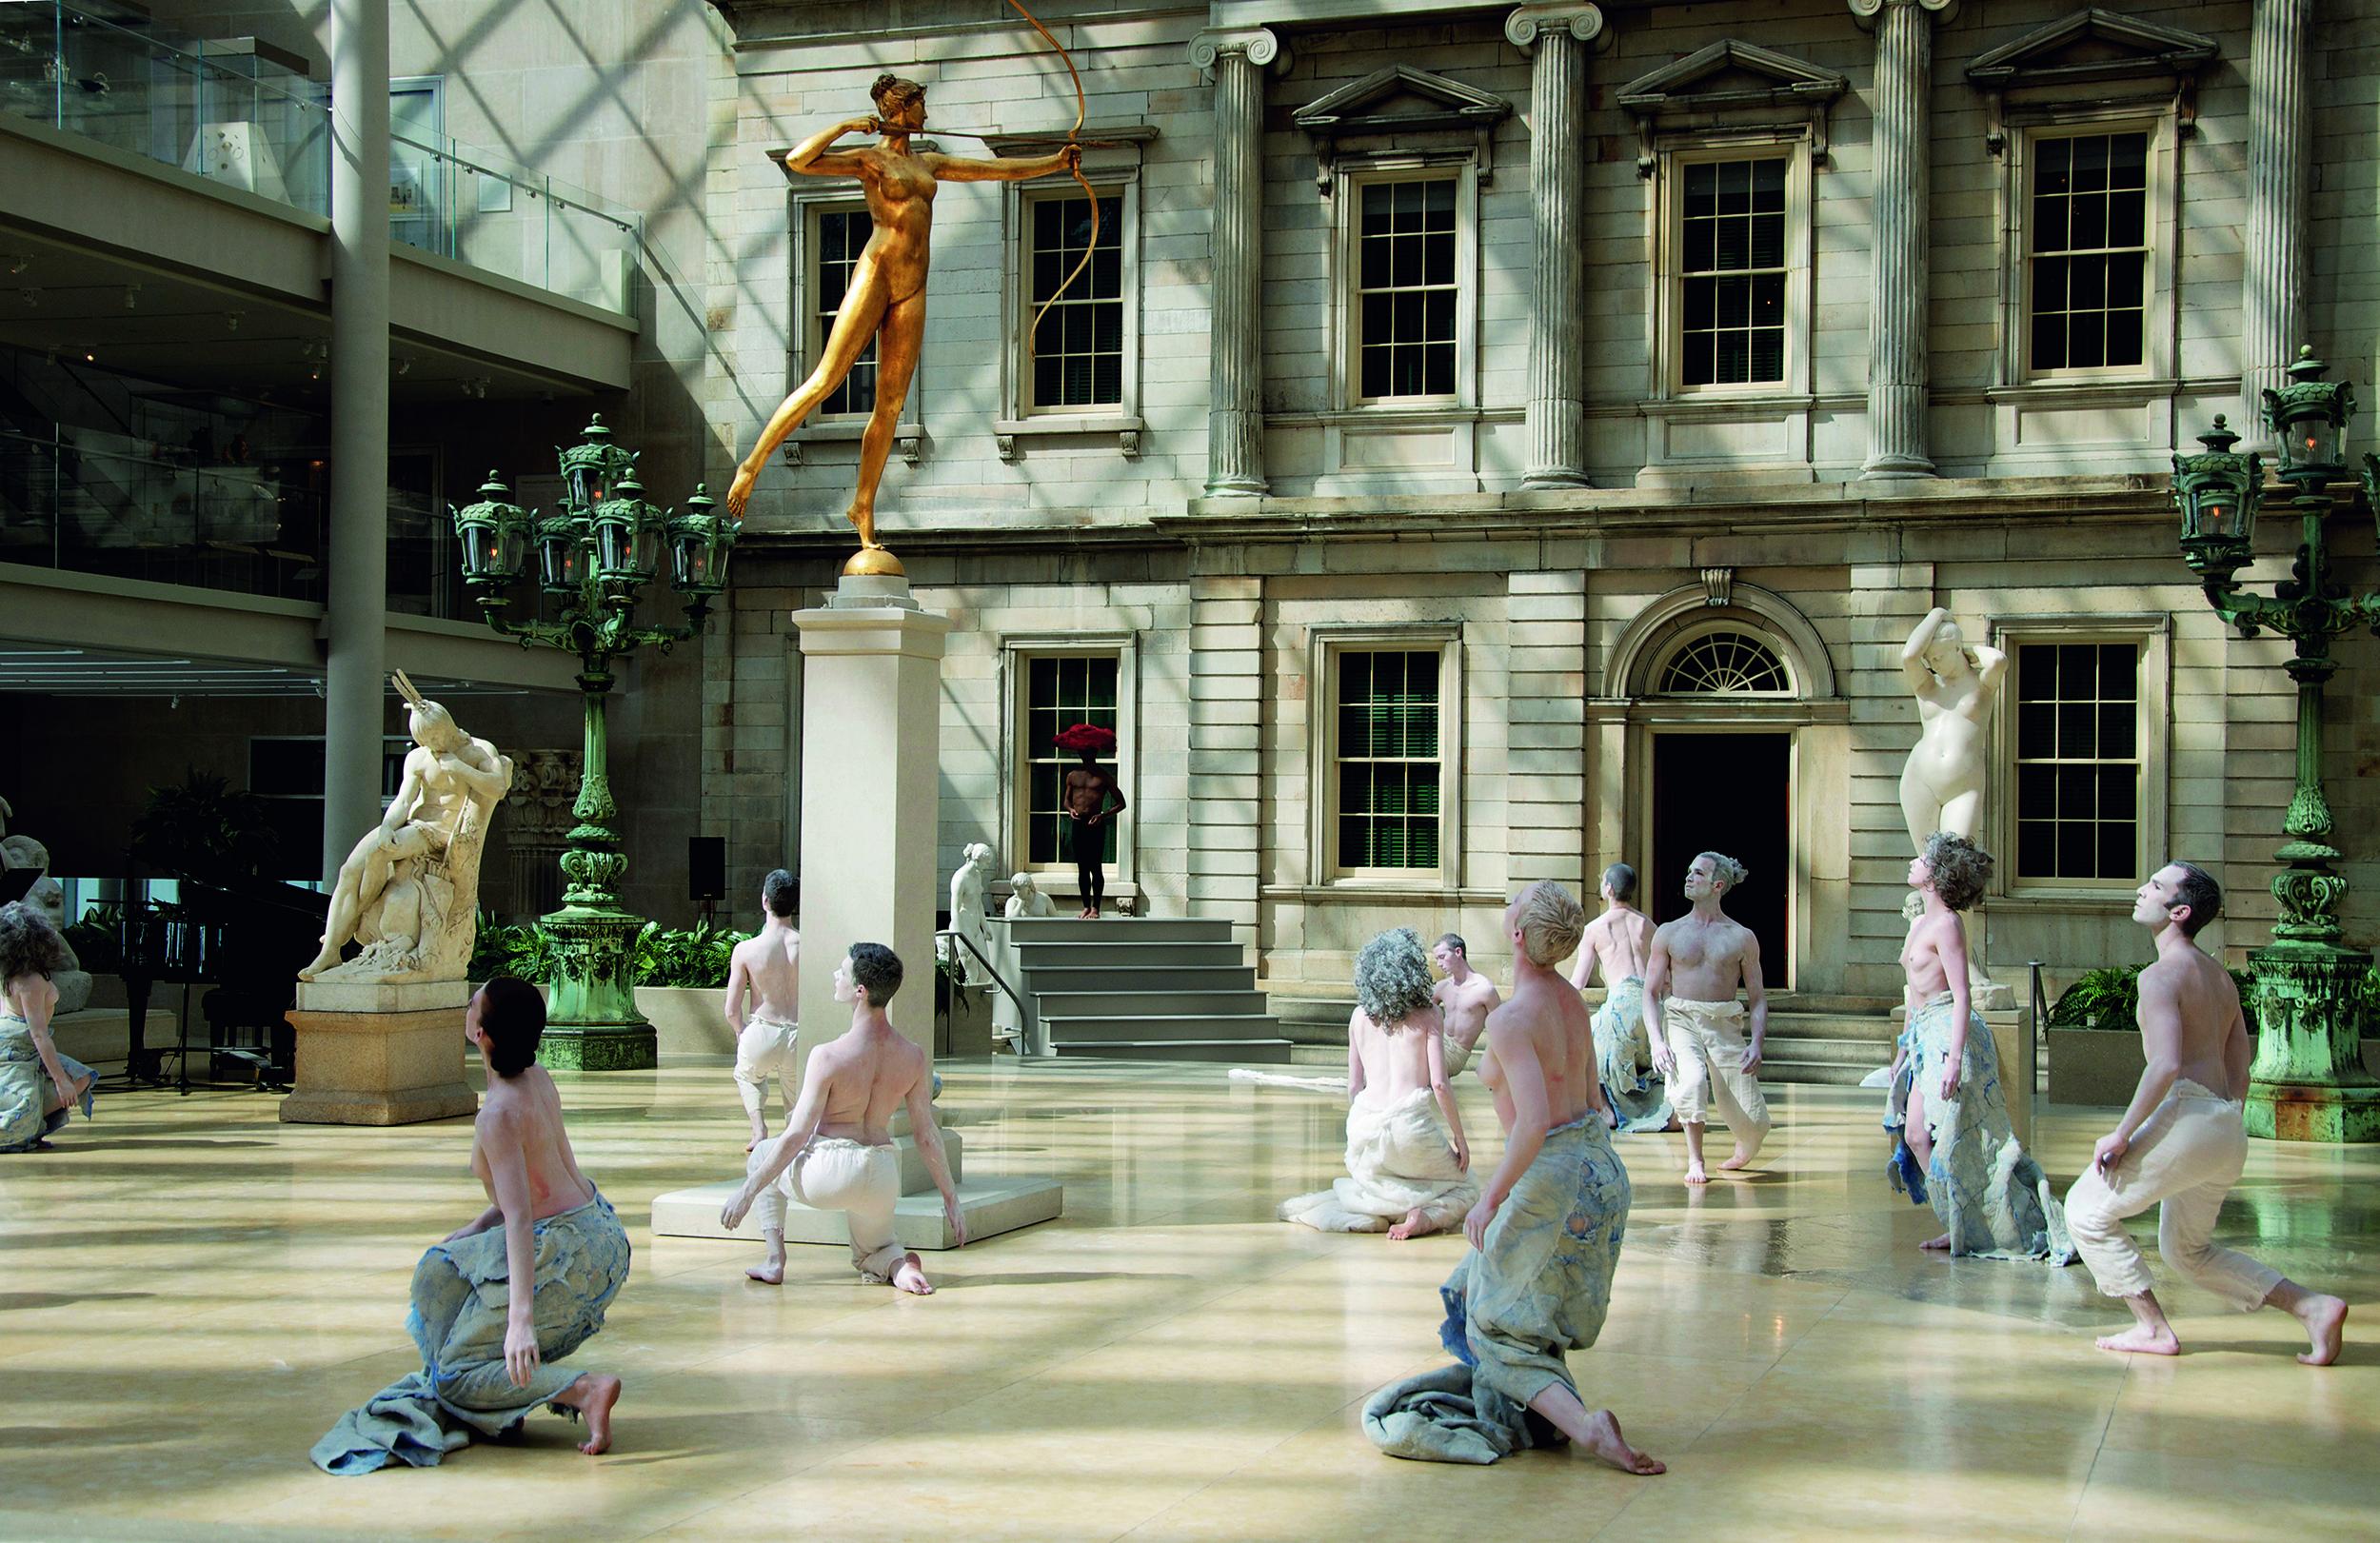 Still Moving at The Metropolitan Museum, NY